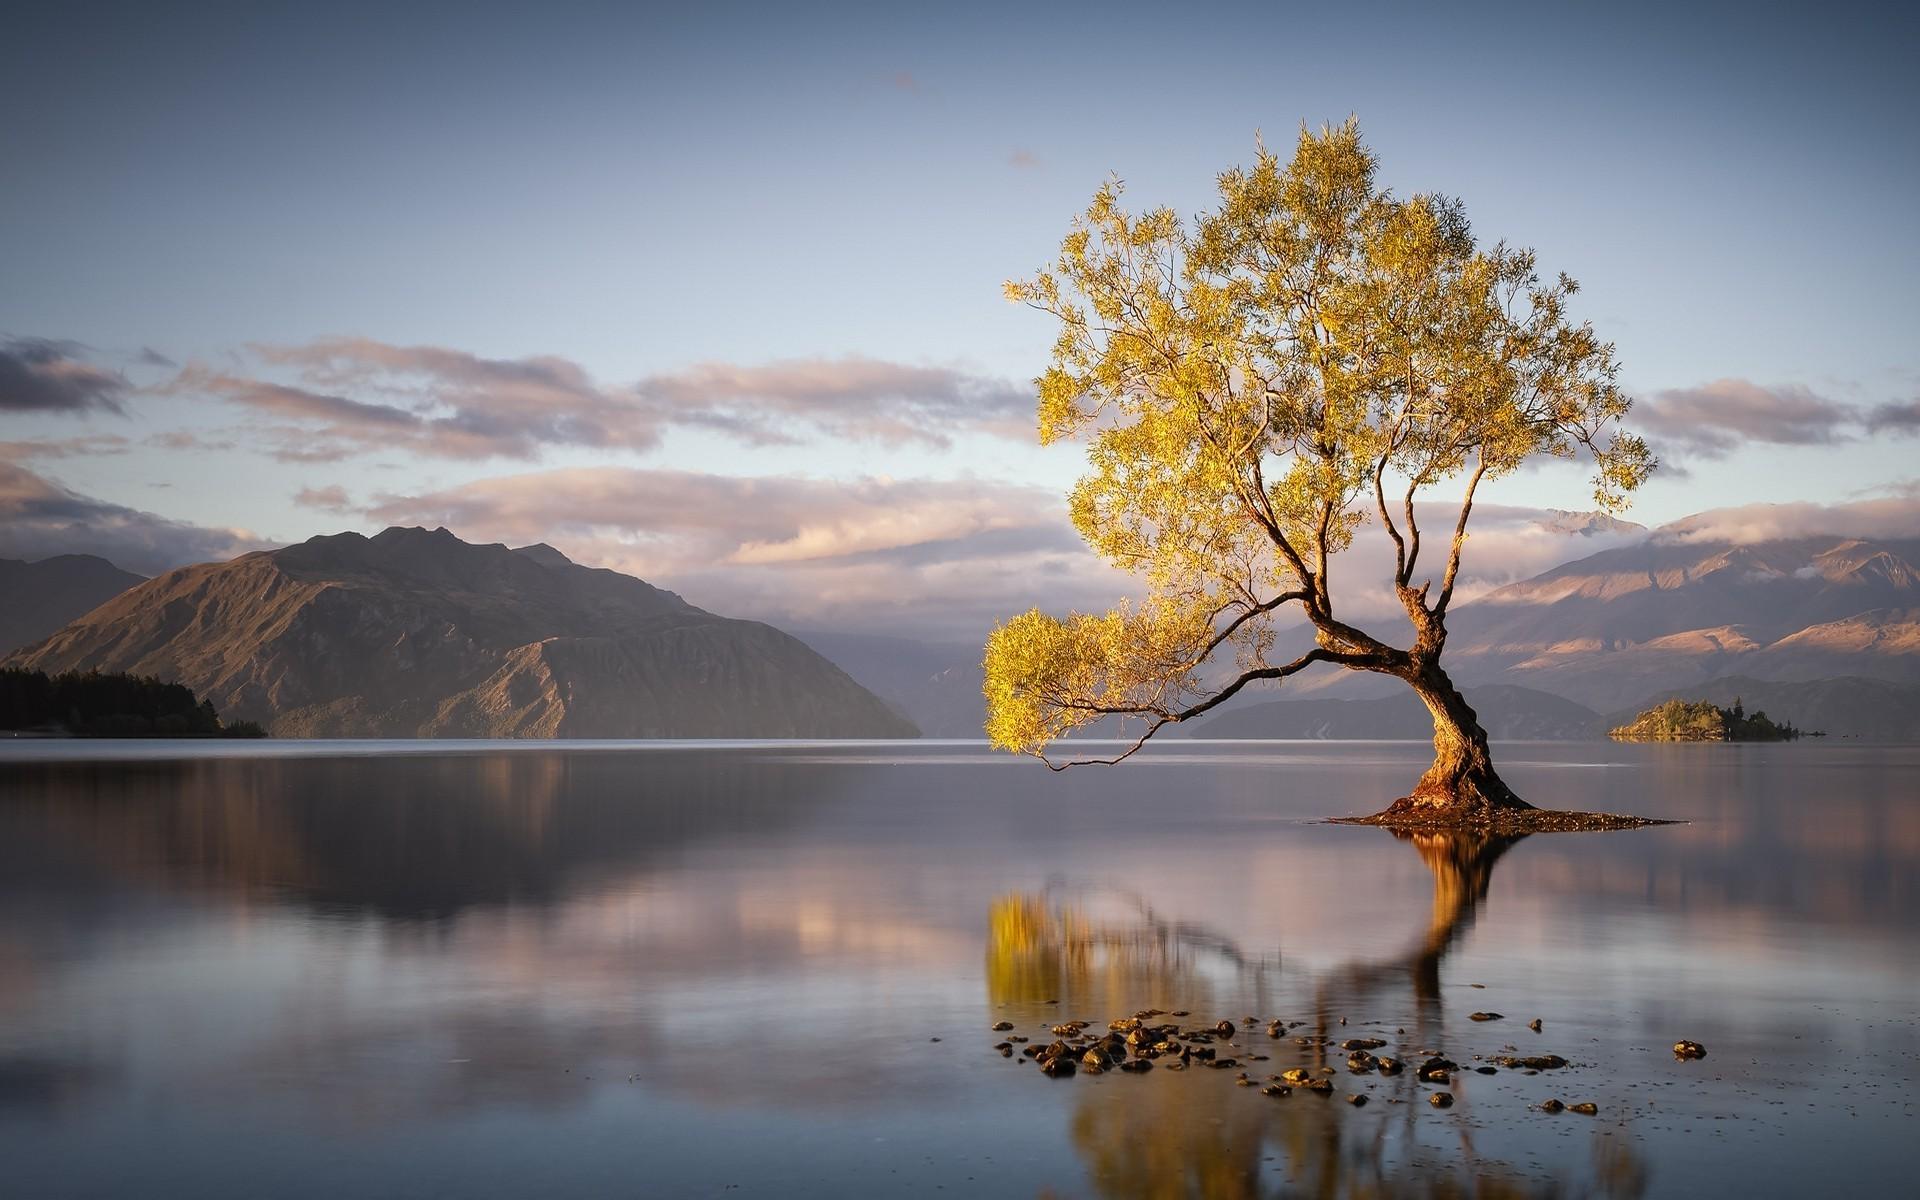 1920x1200, Landscape, Nature, Sunrise, Lake, Trees, - Lake Reflection , HD Wallpaper & Backgrounds